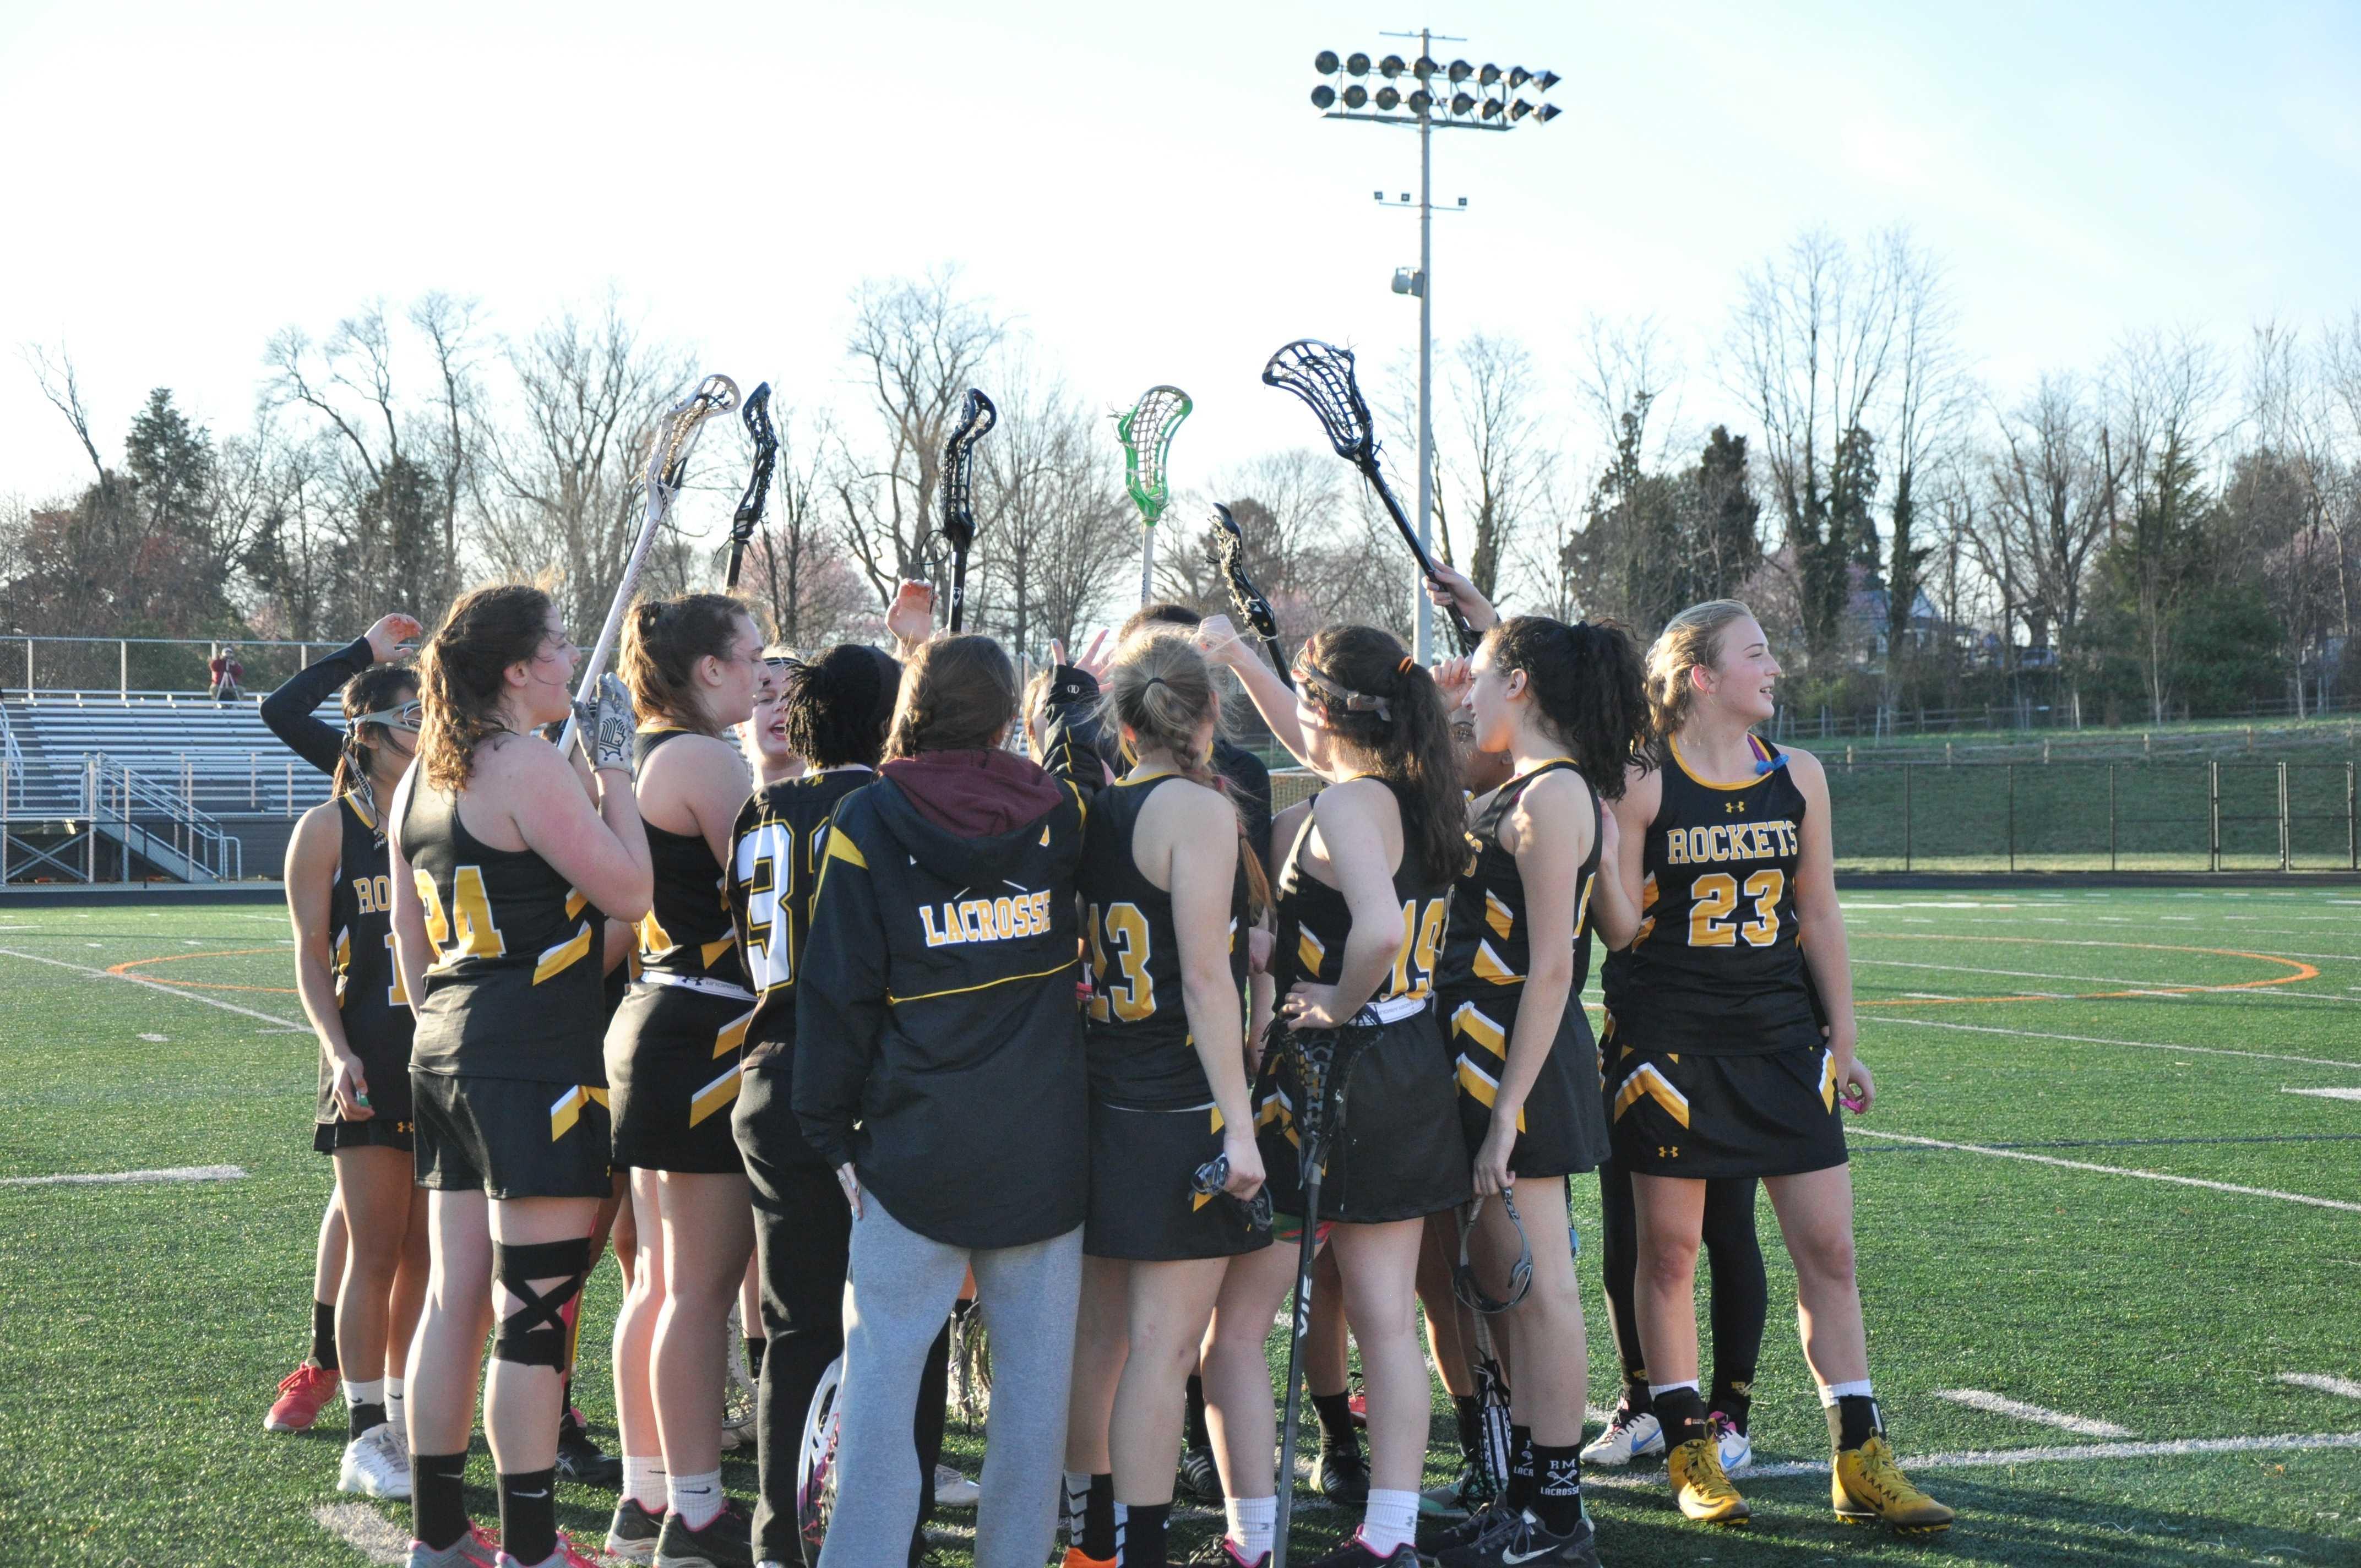 RM girls varsity lacrosse team falls short in game against Gaithersburg High School